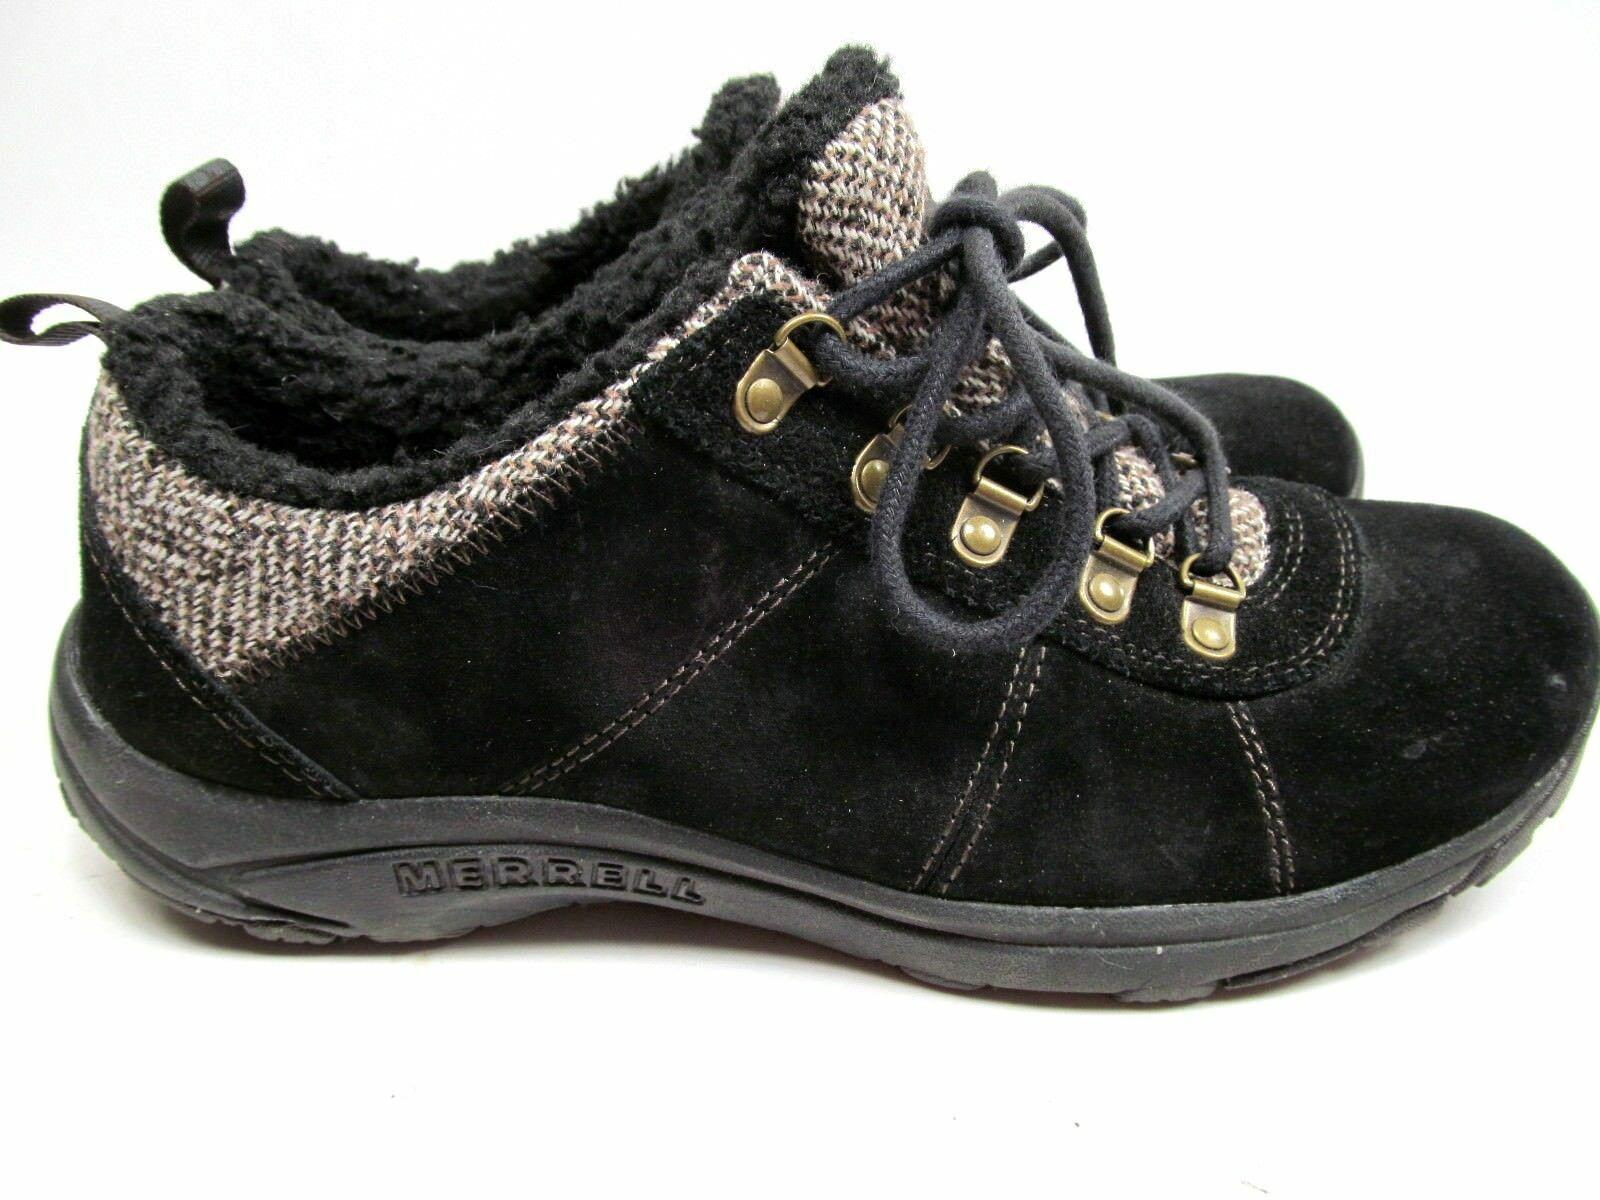 MERRELL Performance Women's Black Suede & Faux Fur Walking Shoes 9 M image 2